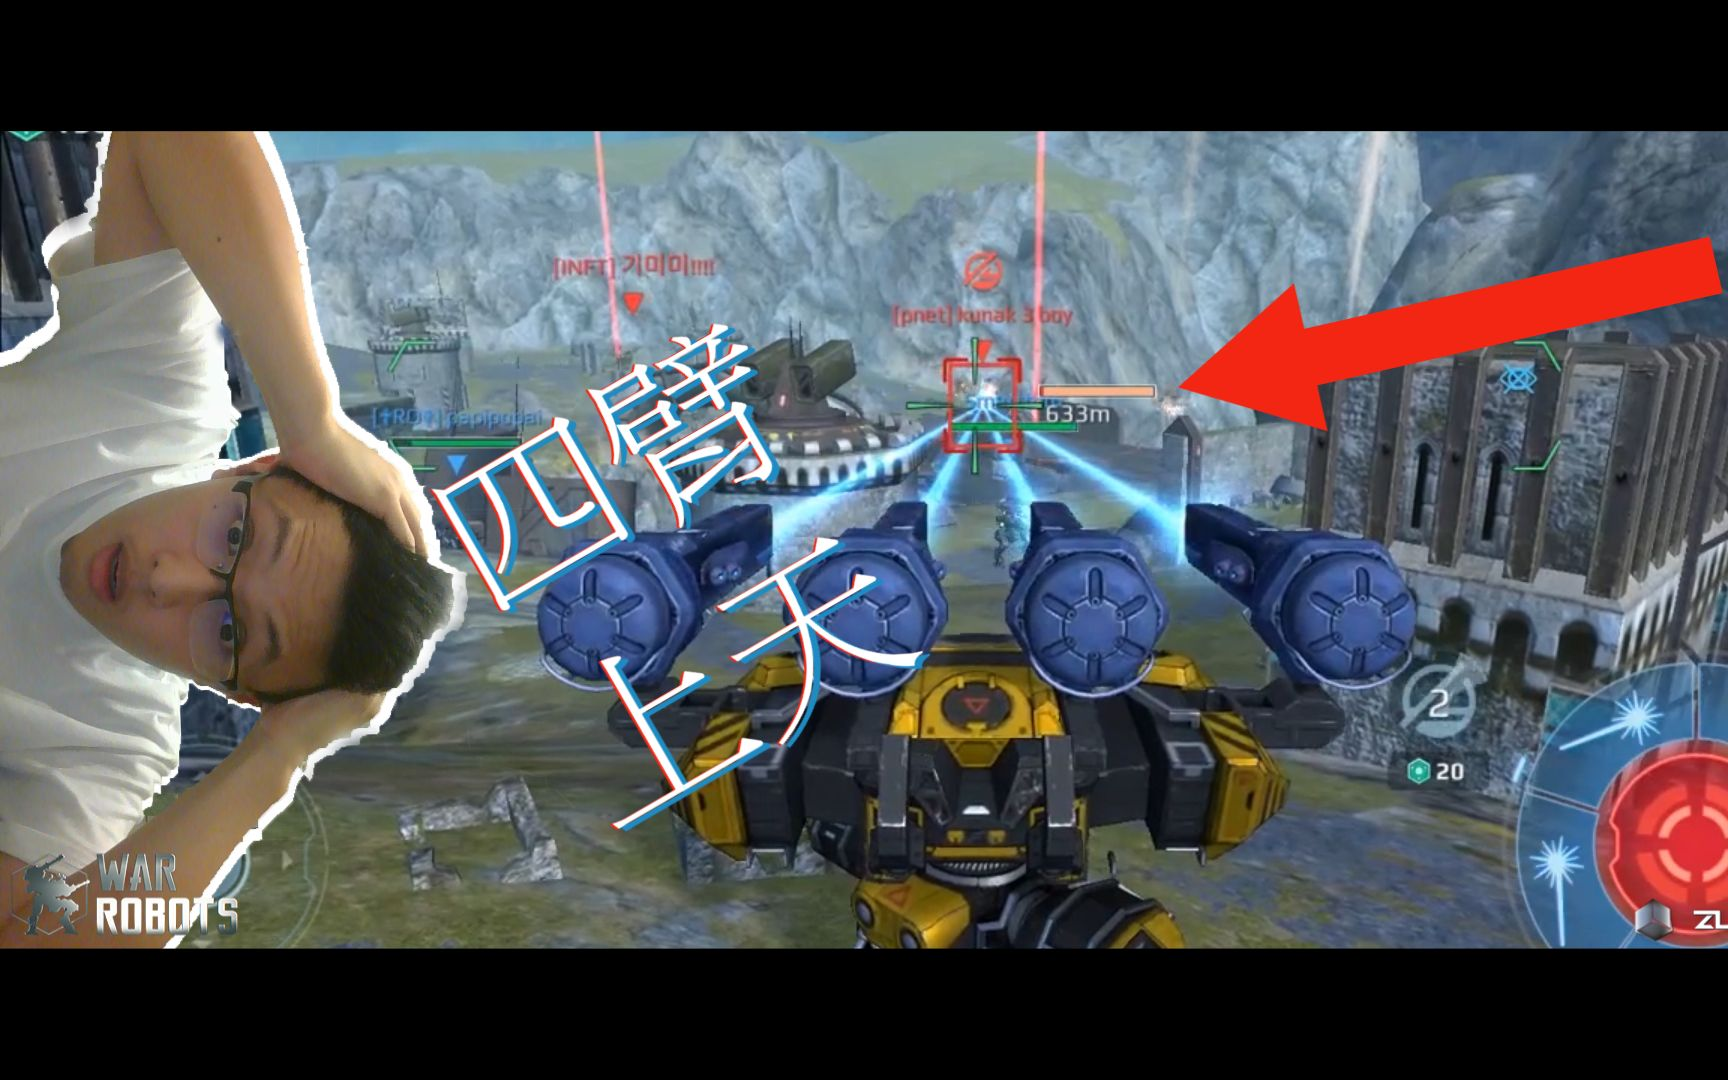 【War Robots】5秒一個滿血的四臂被黑錘送上西天了?